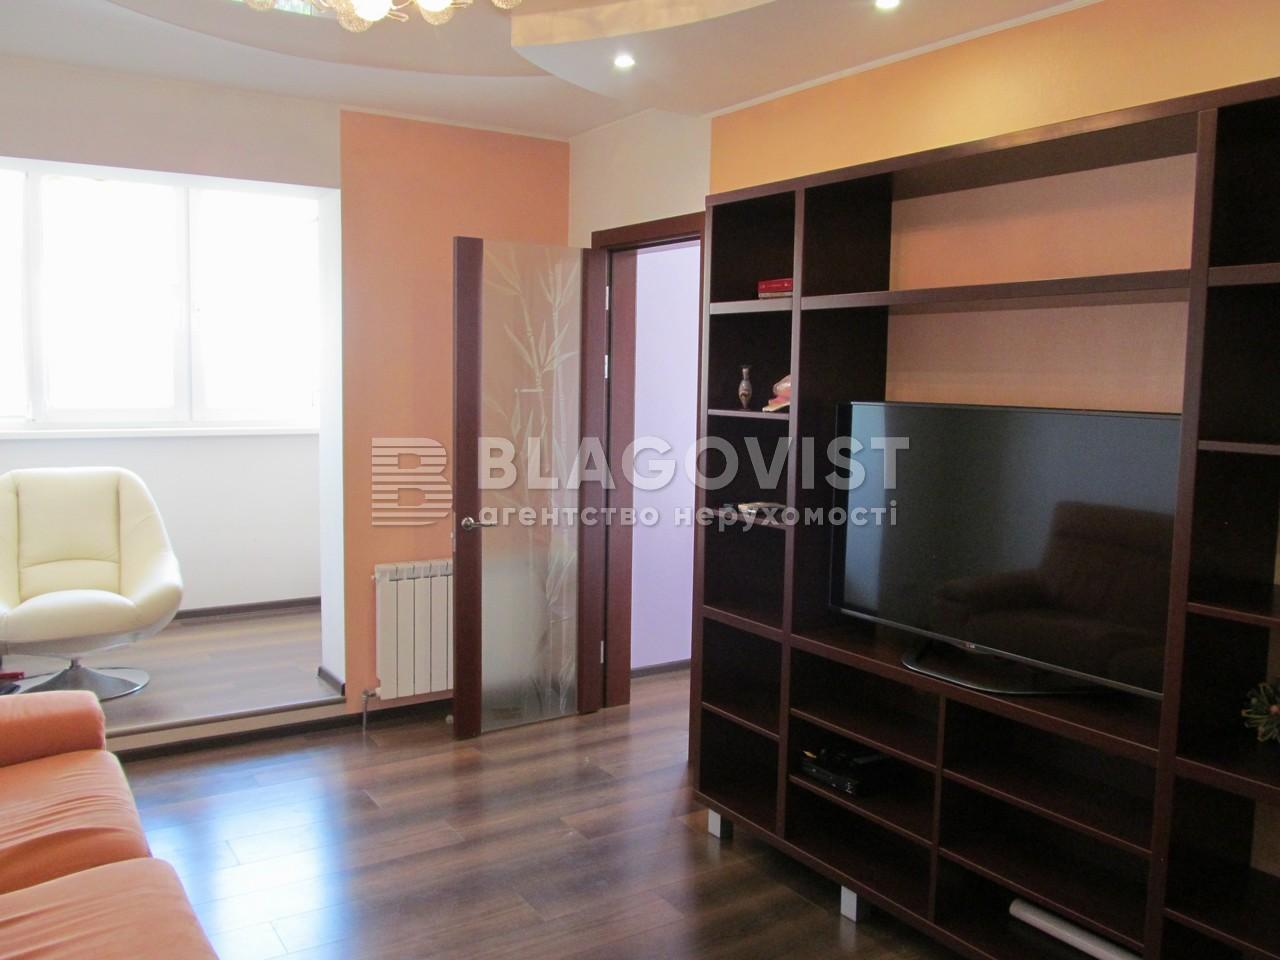 Квартира R-17985, Правды просп., 5б, Киев - Фото 5